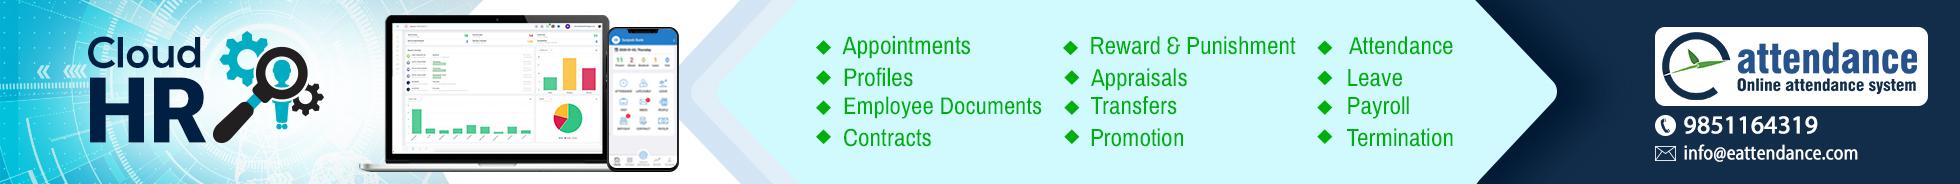 Online attendance, leave, payroll system & HR system